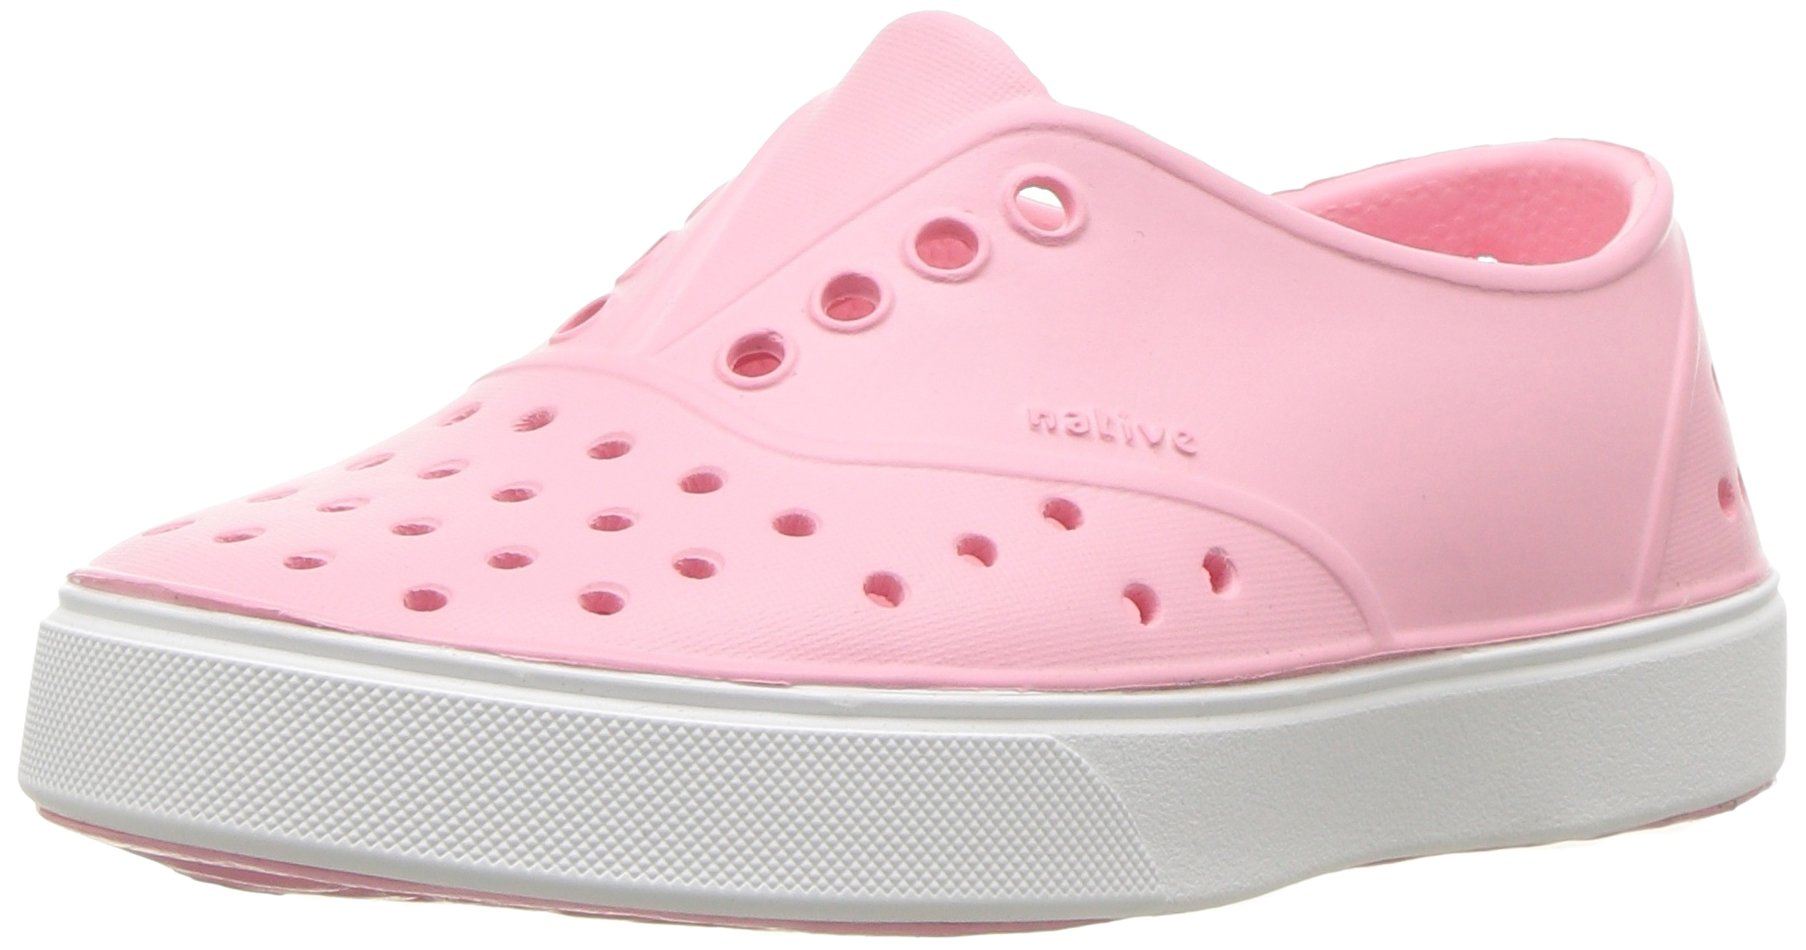 Native baby-girls Miller Water Proof Shoes, Princess Pink/Shell White, 6 Medium US Toddler